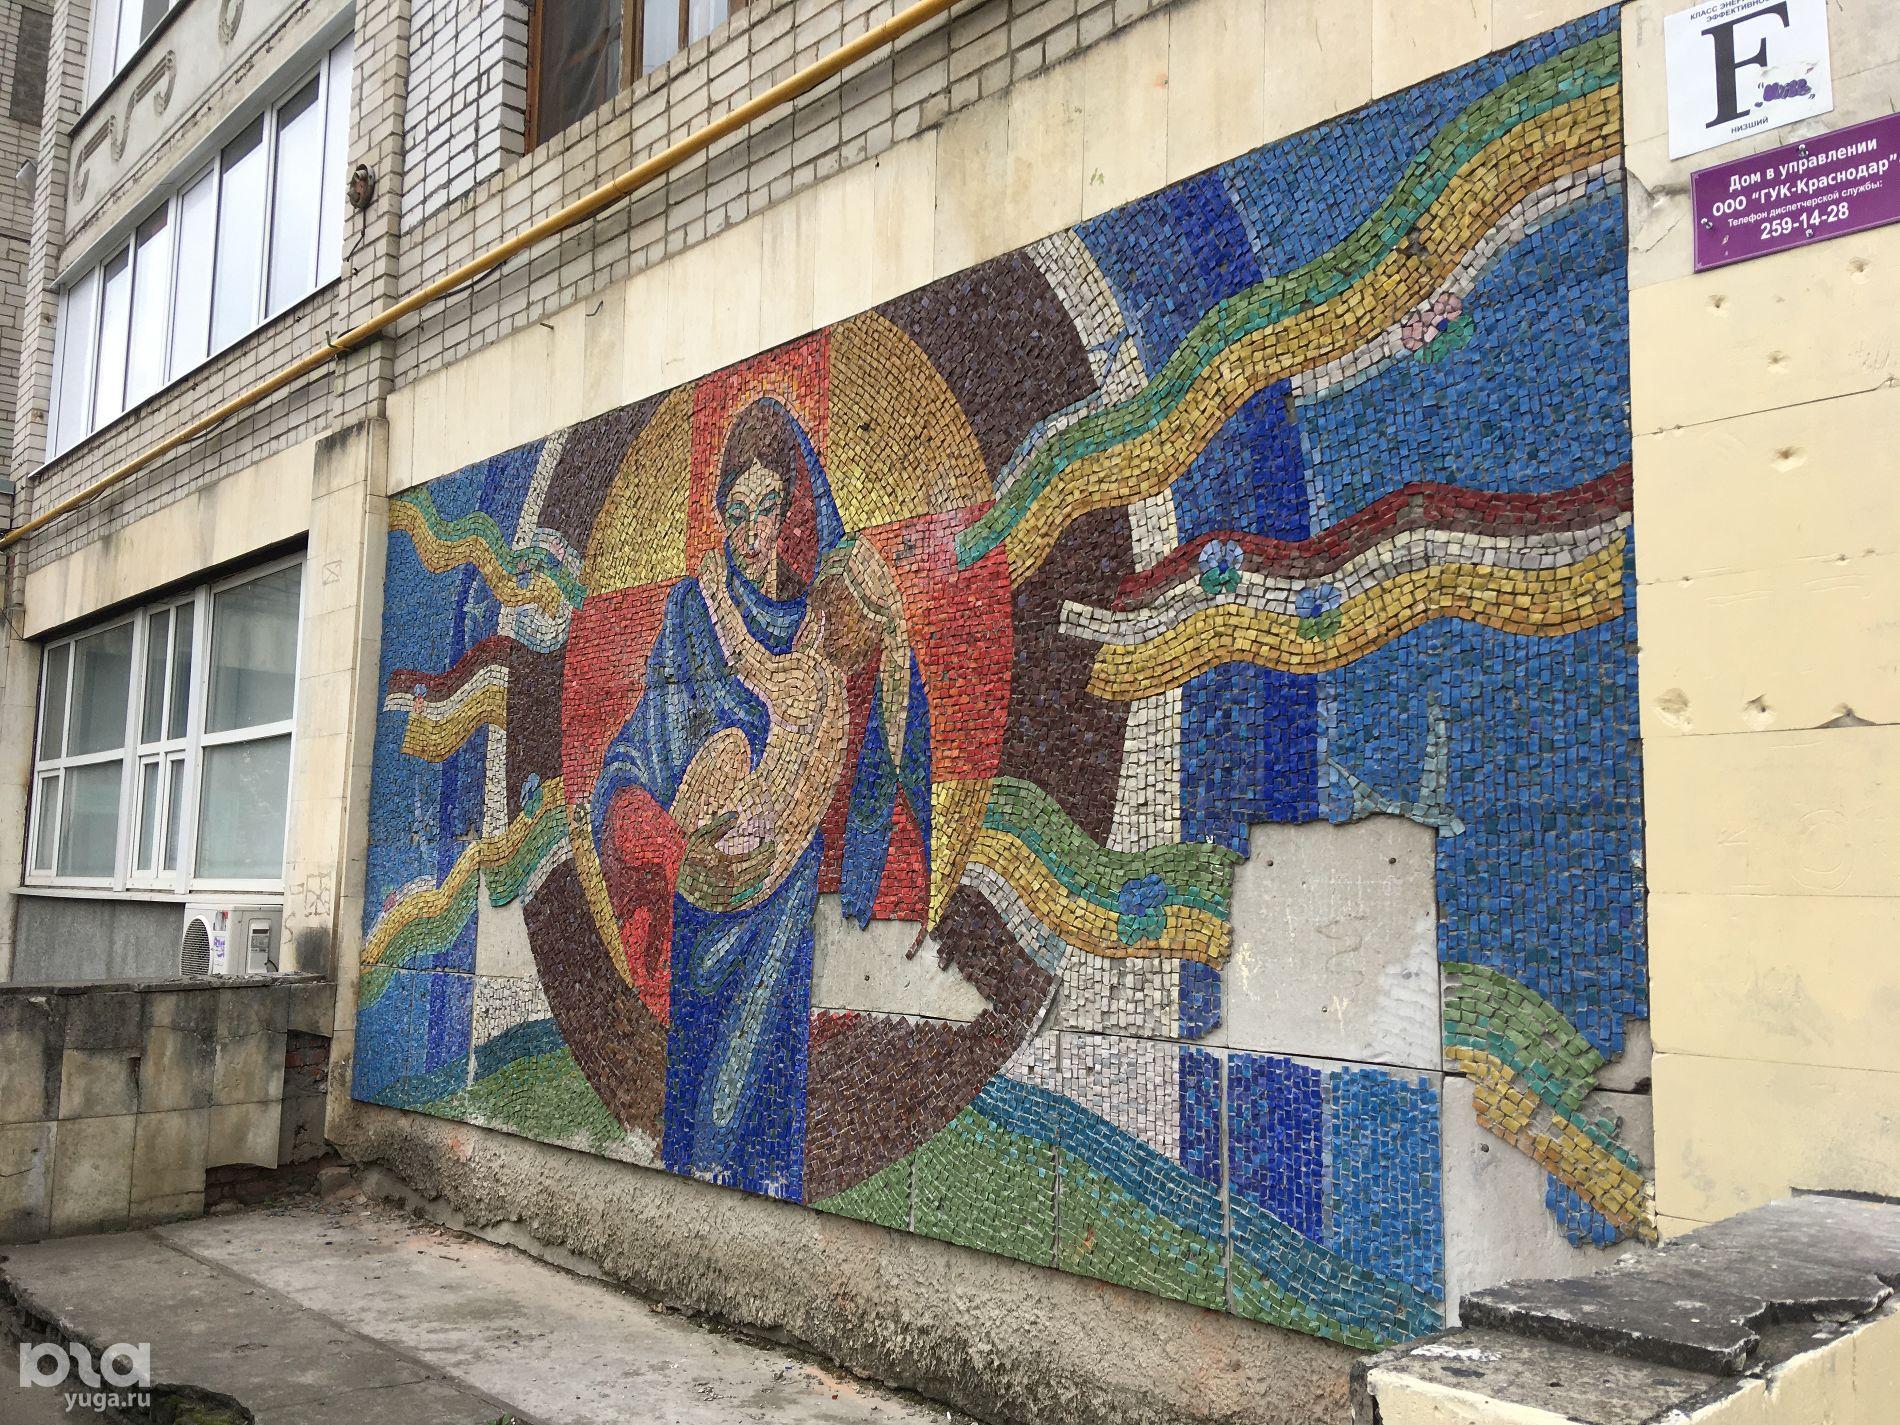 Мозаика на доме №53 по улице Вишняковой ©Тимур Рыжков, Юга.ру